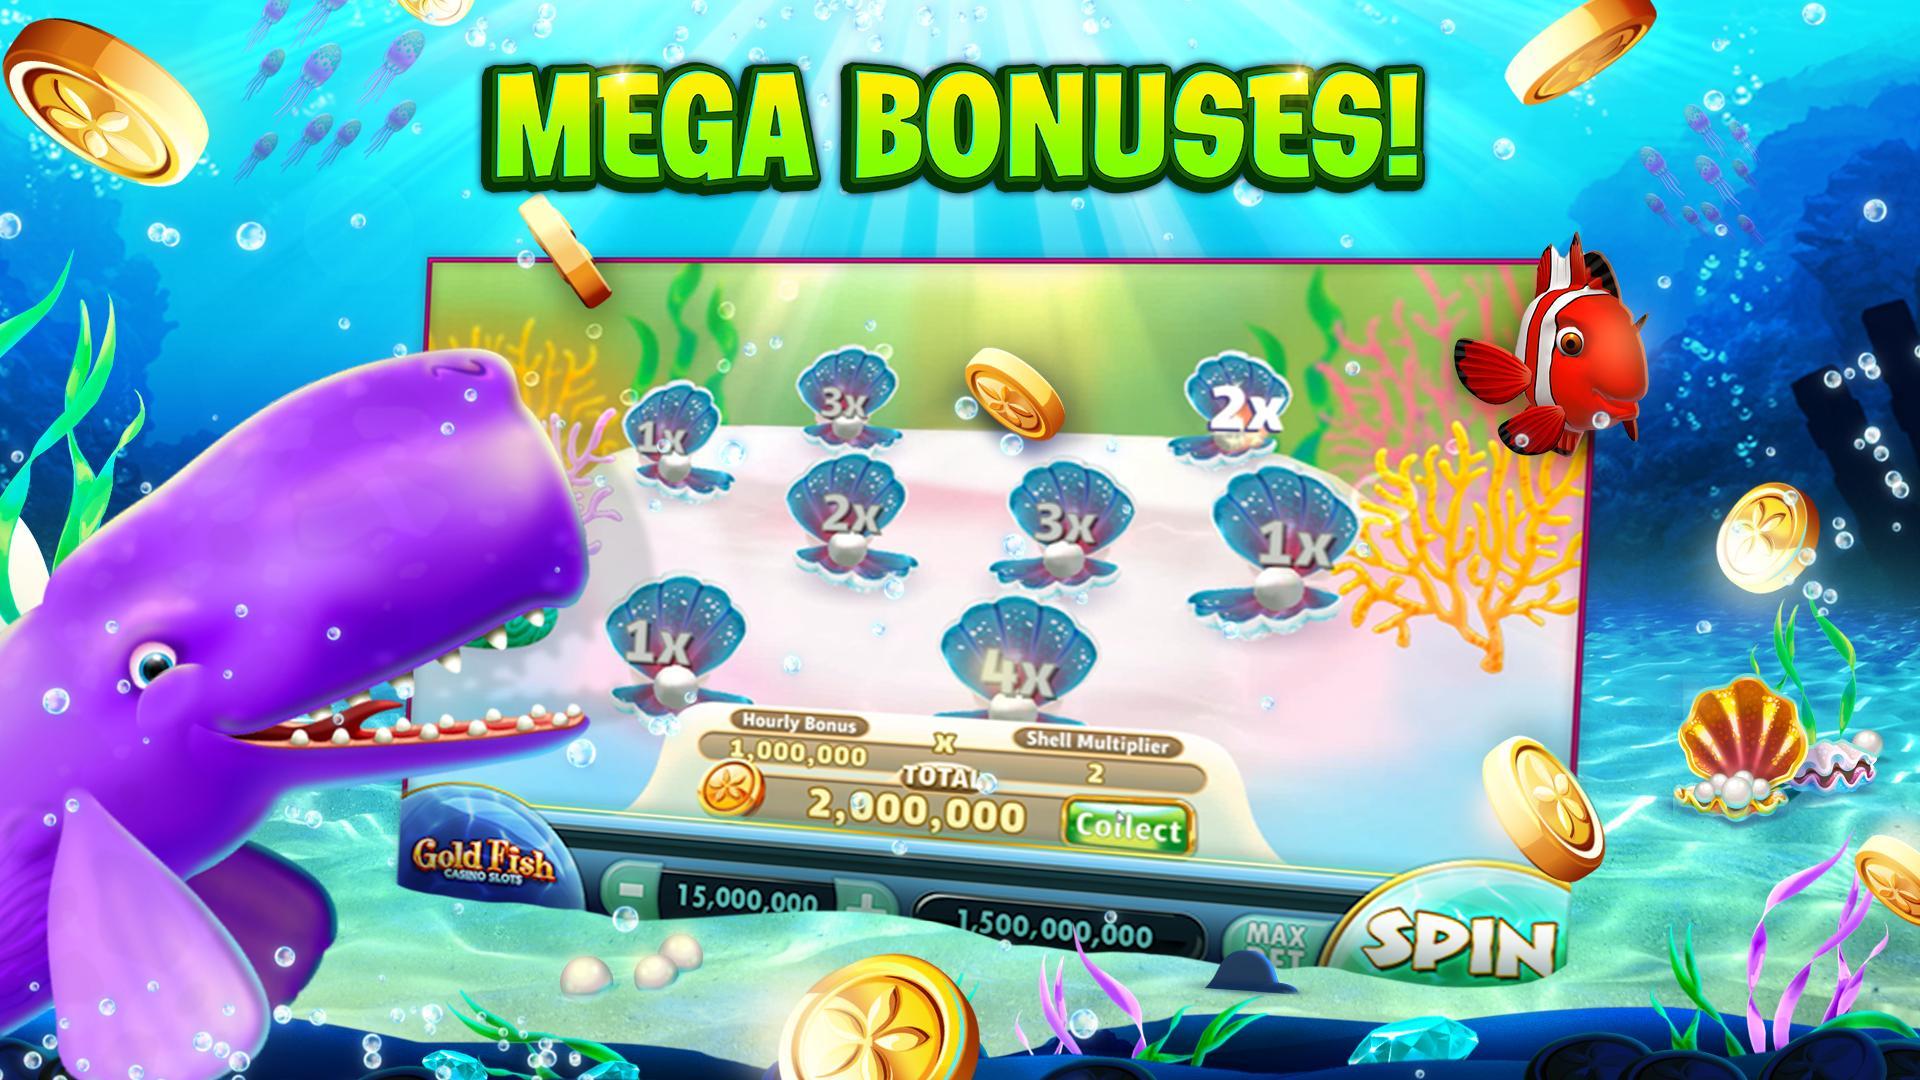 Gold Fish Casino Slots - FREE Slot Machine Games 25.09.00 Screenshot 19